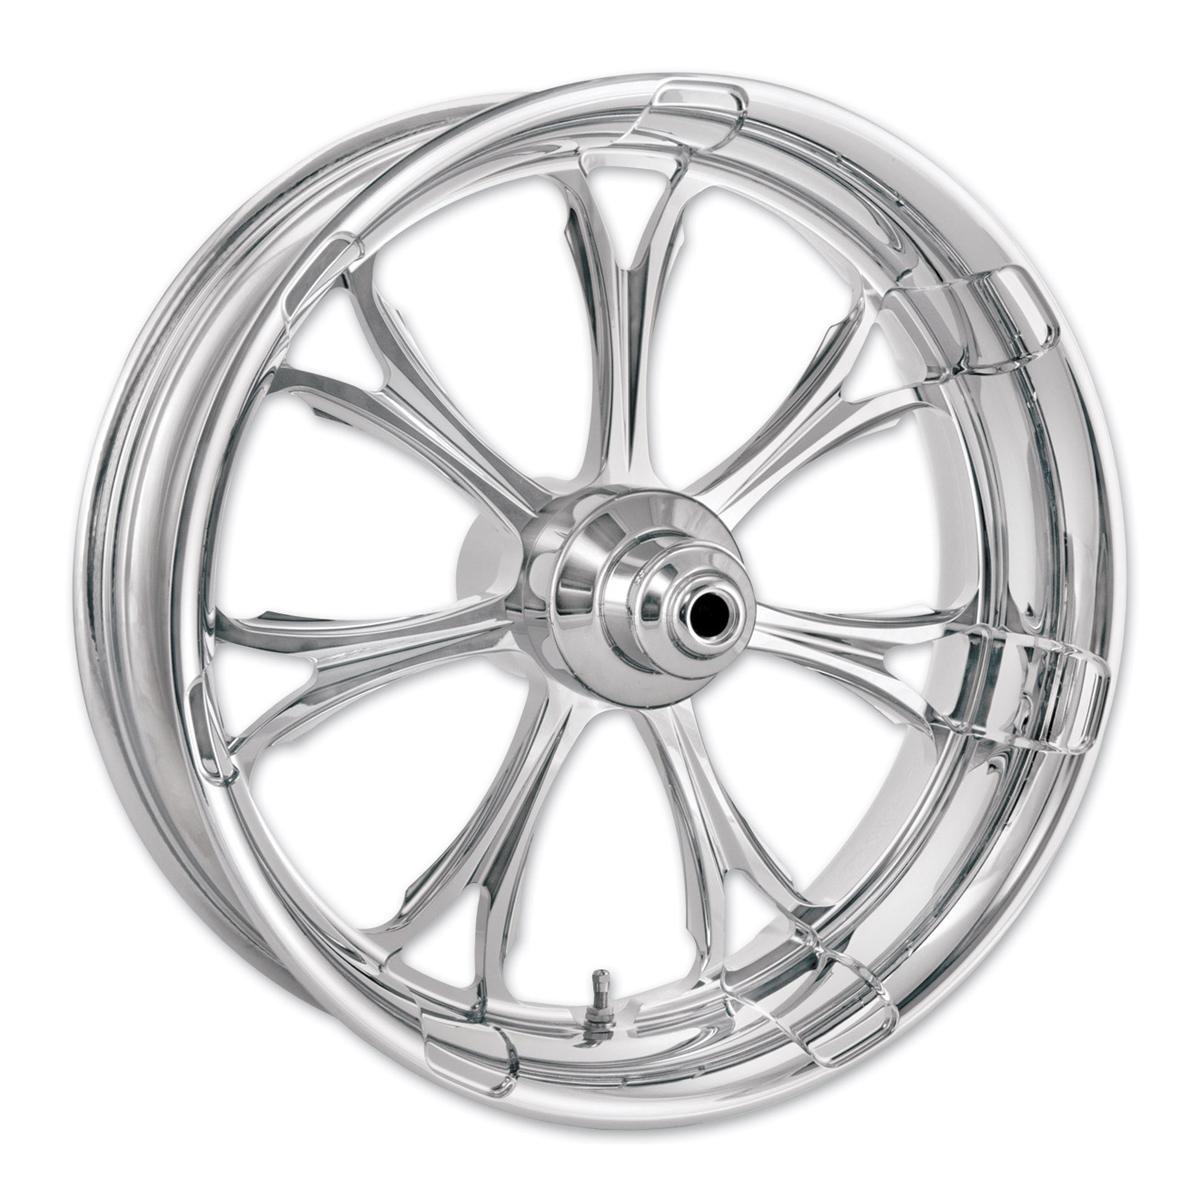 Performance Machine Paramount Chrome Rear Wheel 18x5.5